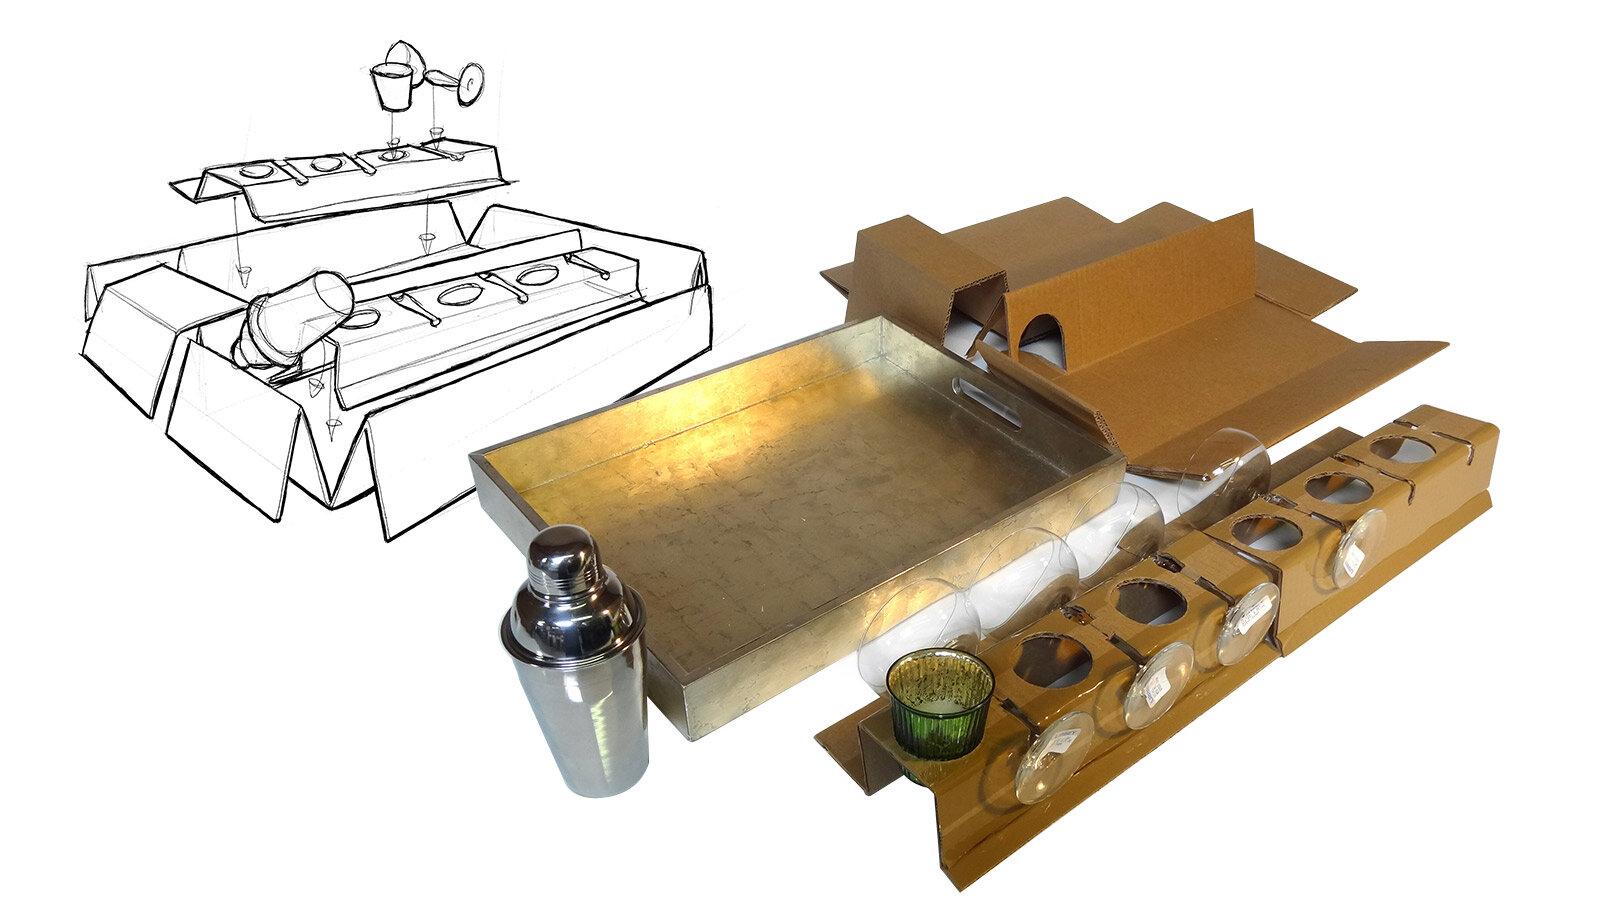 West-Elm-Box-Packaging-Company-Design-3.JPG